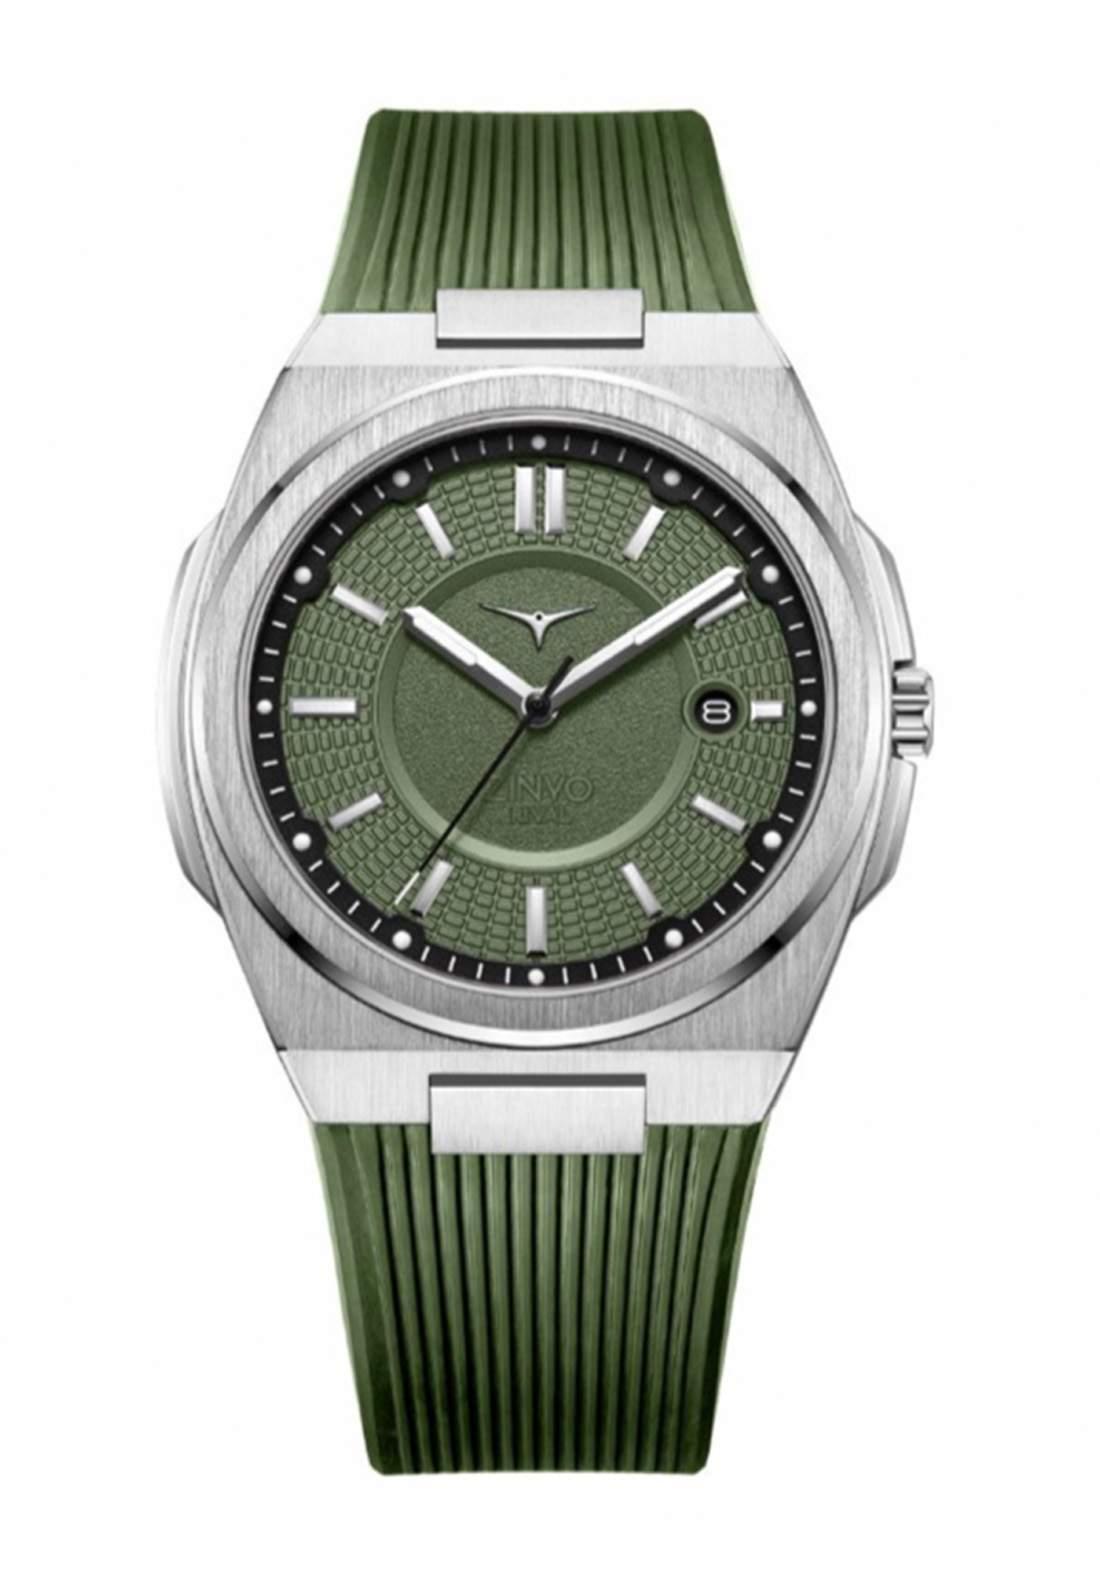 Zinvo Rival Oasis Watch For Men - Green  ساعة رجالي